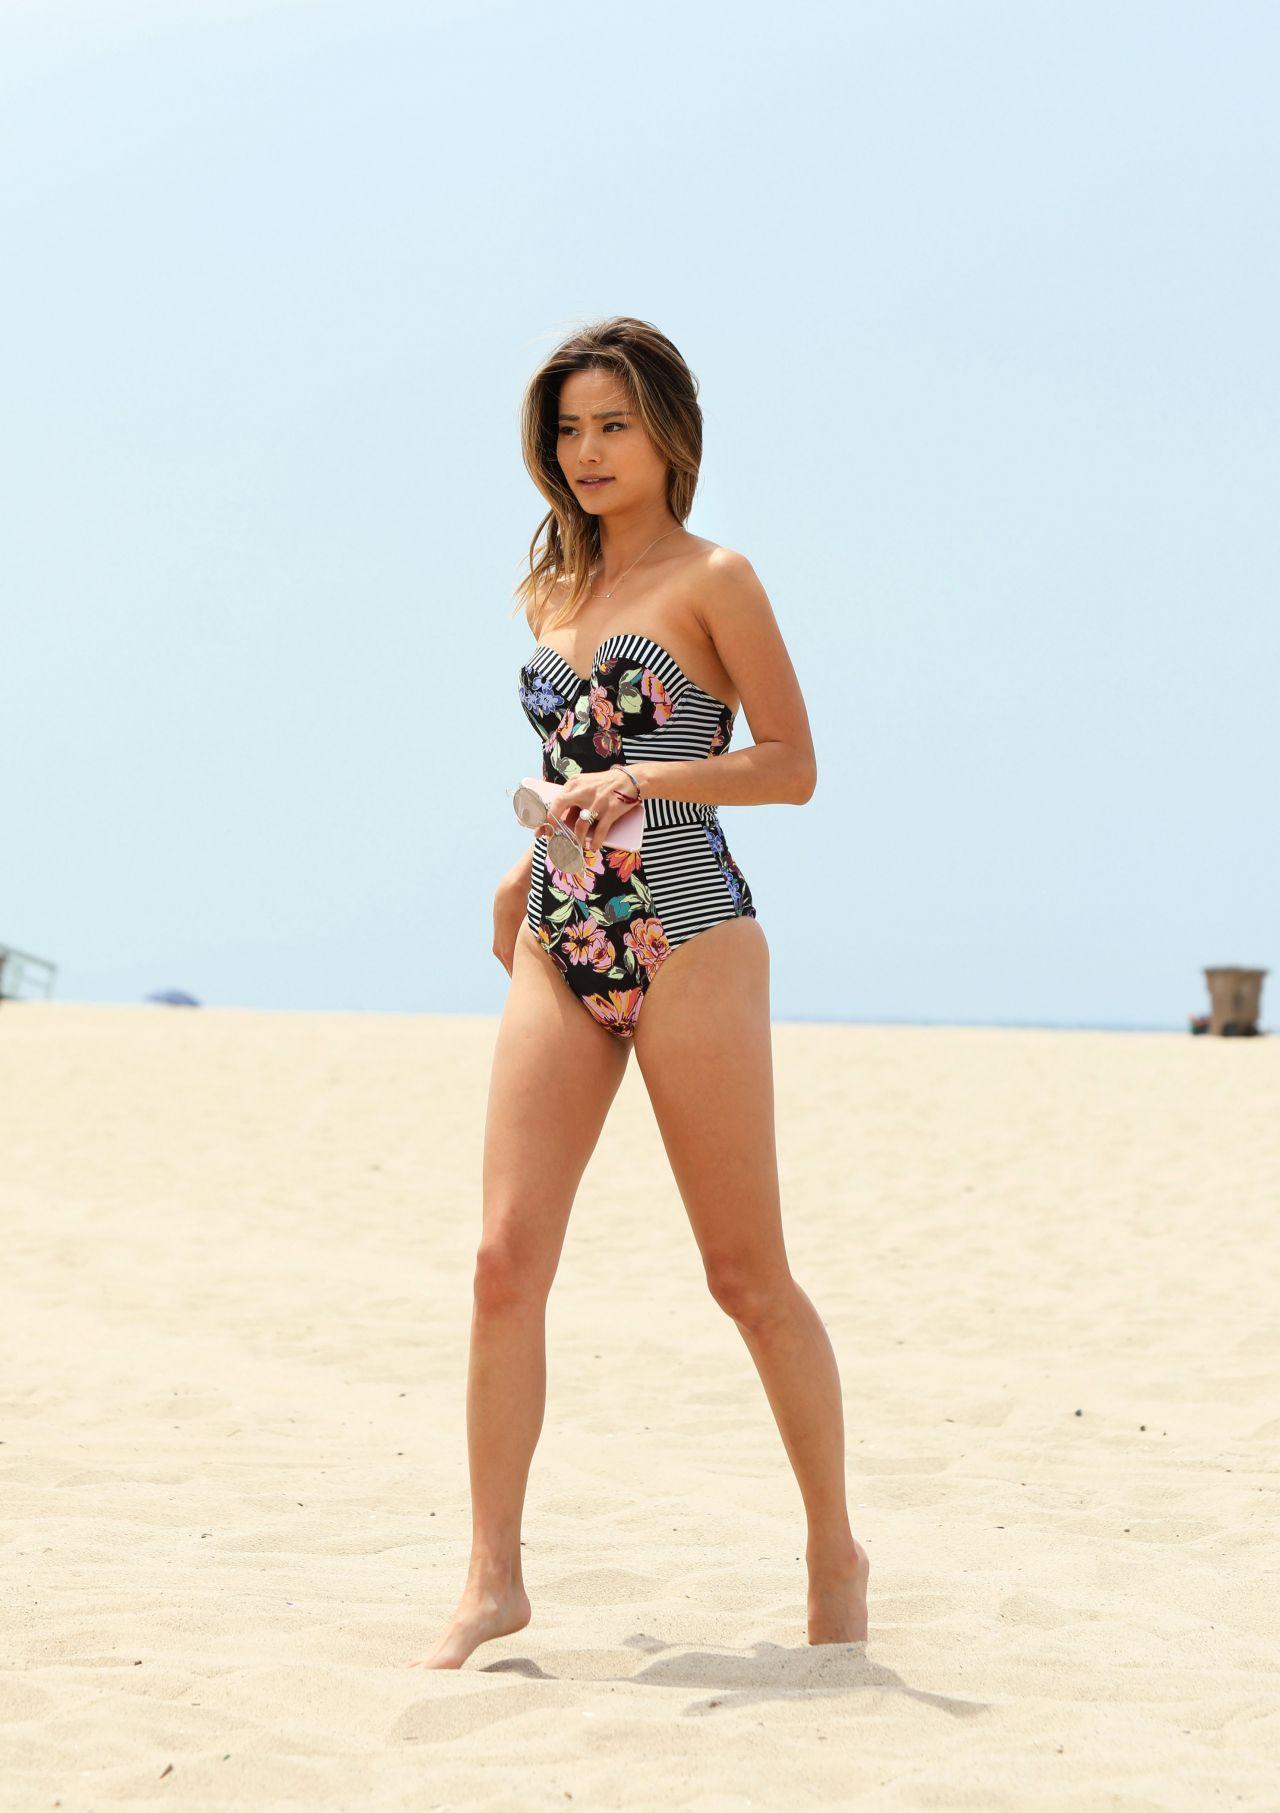 Bikini Kelsea Ballerini nudes (78 photo), Topless, Cleavage, Instagram, underwear 2019